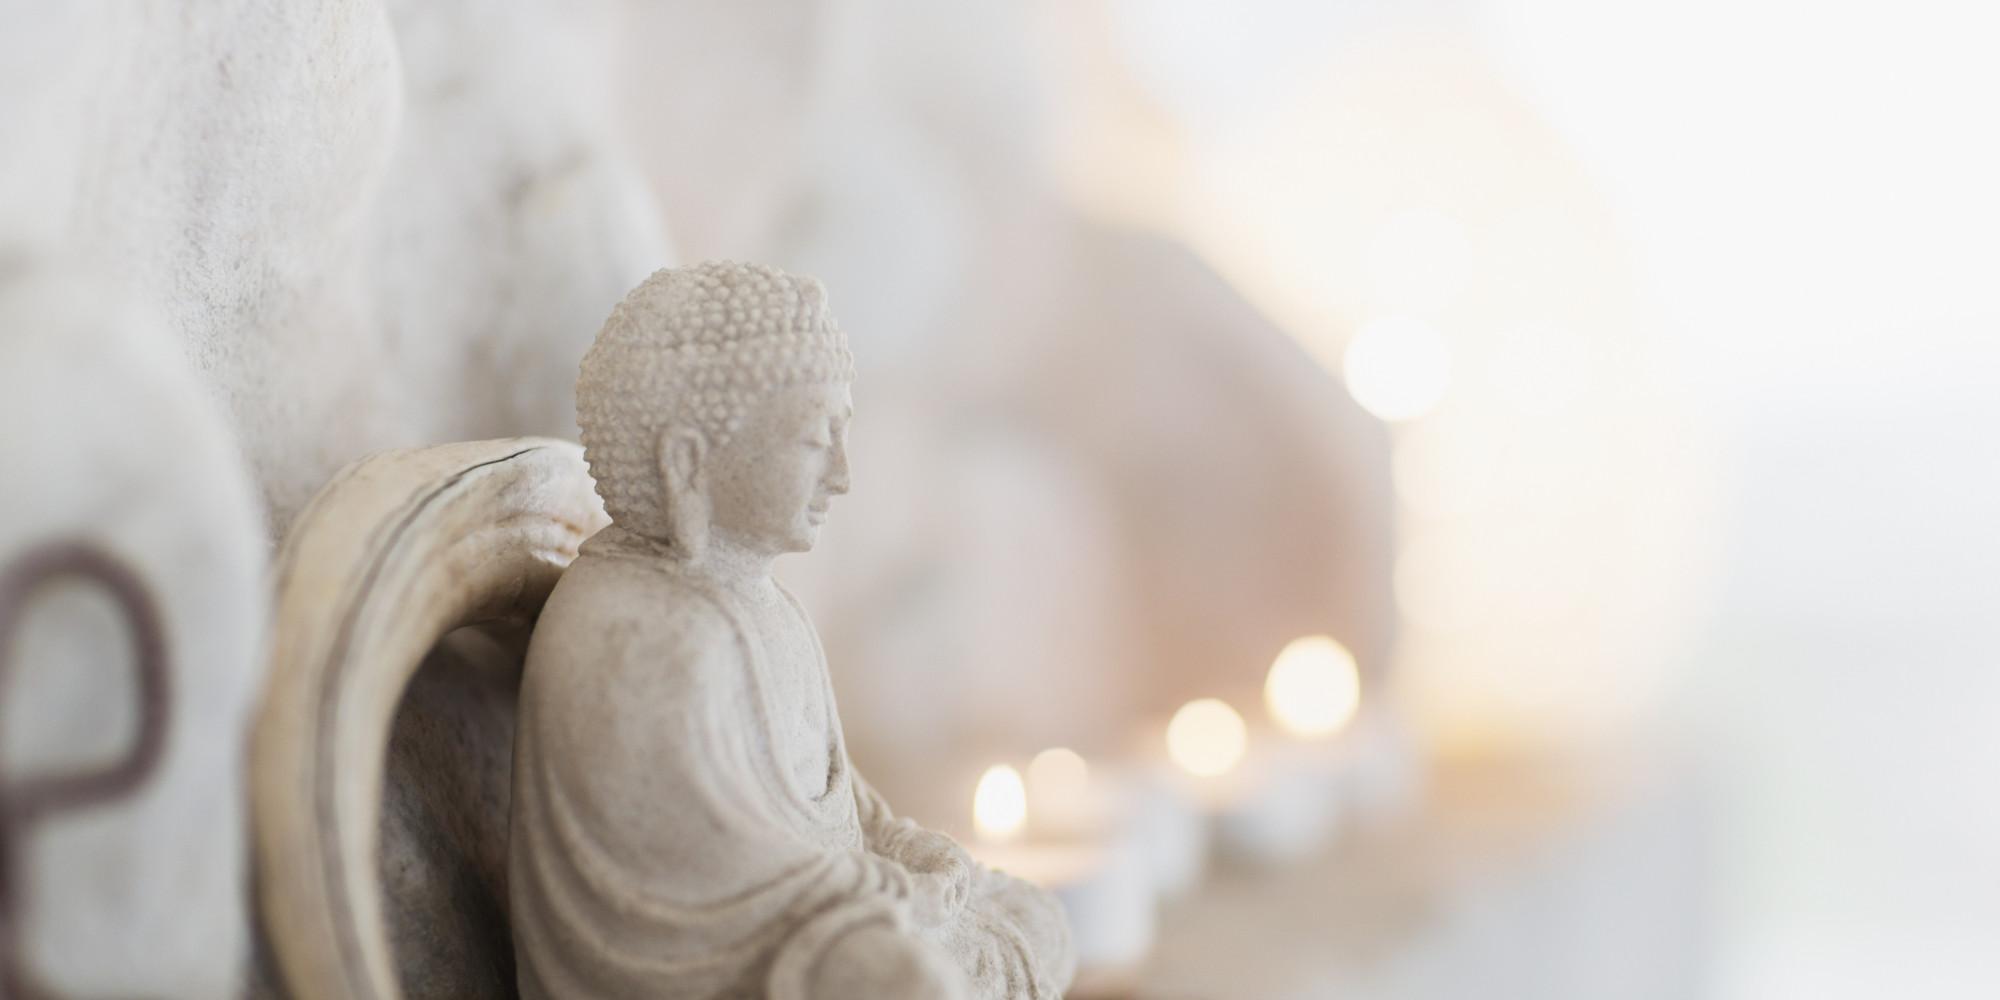 Hd Wallpaper Gautam Buddha Refuge Recovery A Buddhist Path To Addiction Recovery